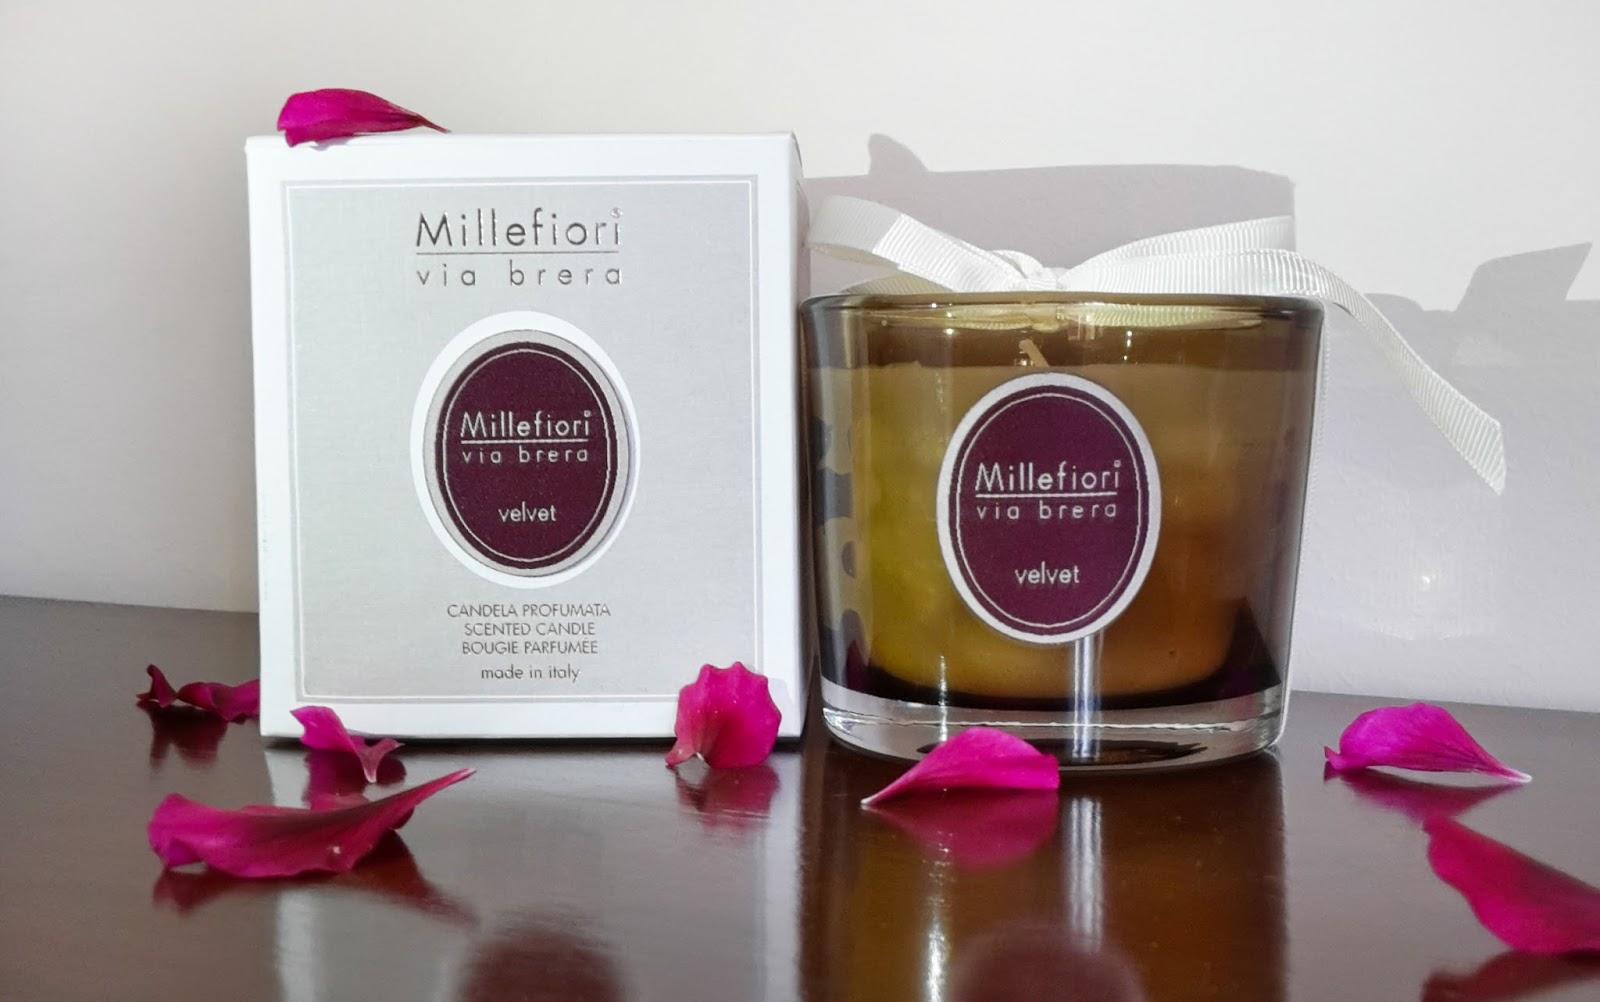 Candele Da Giardino Milano : Candle s u cbru e millefiori milano pier ef fect